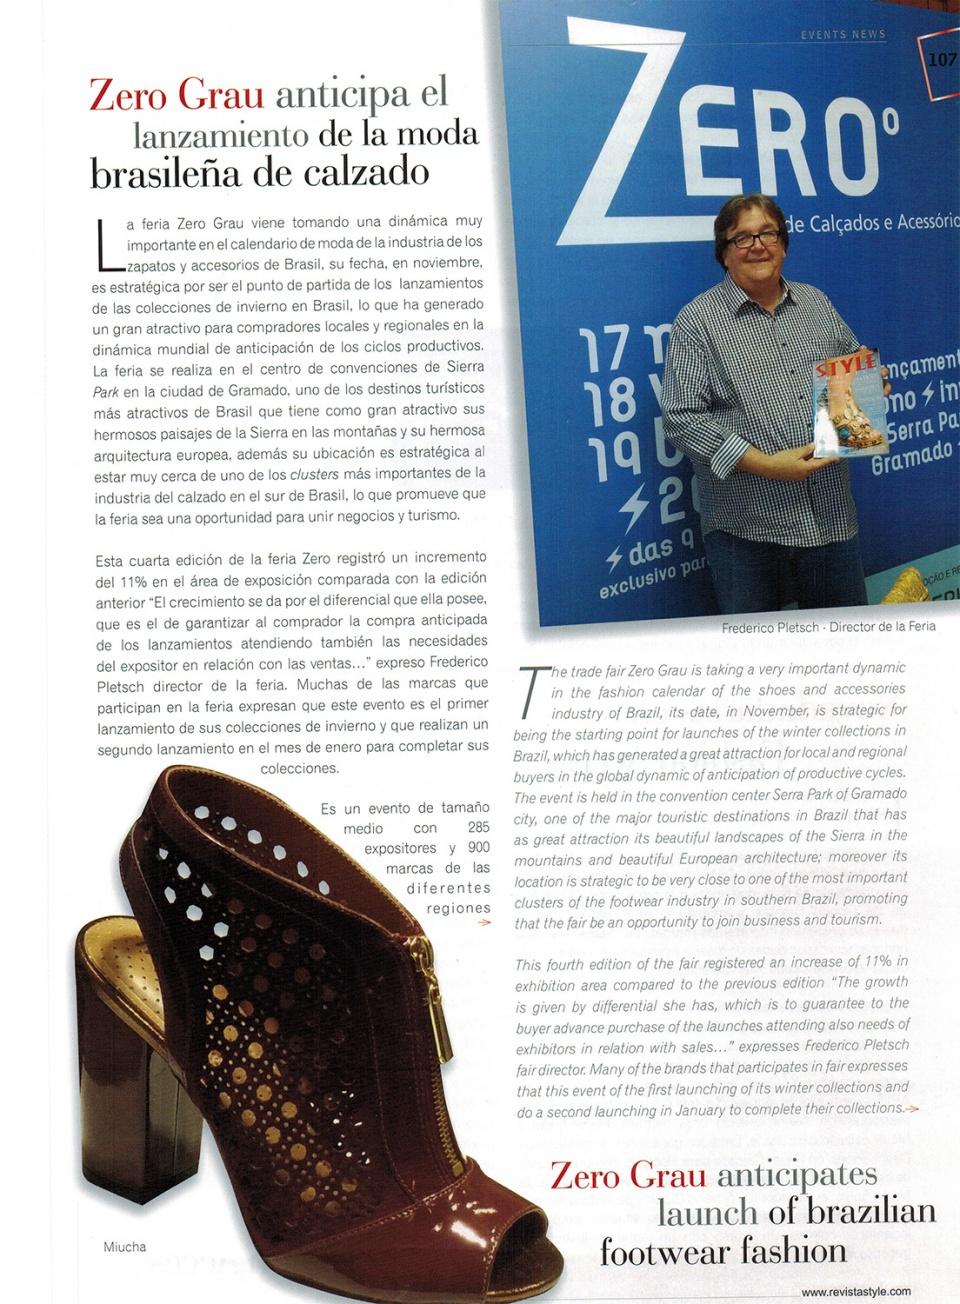 Revista Style America - COLÔMBIA